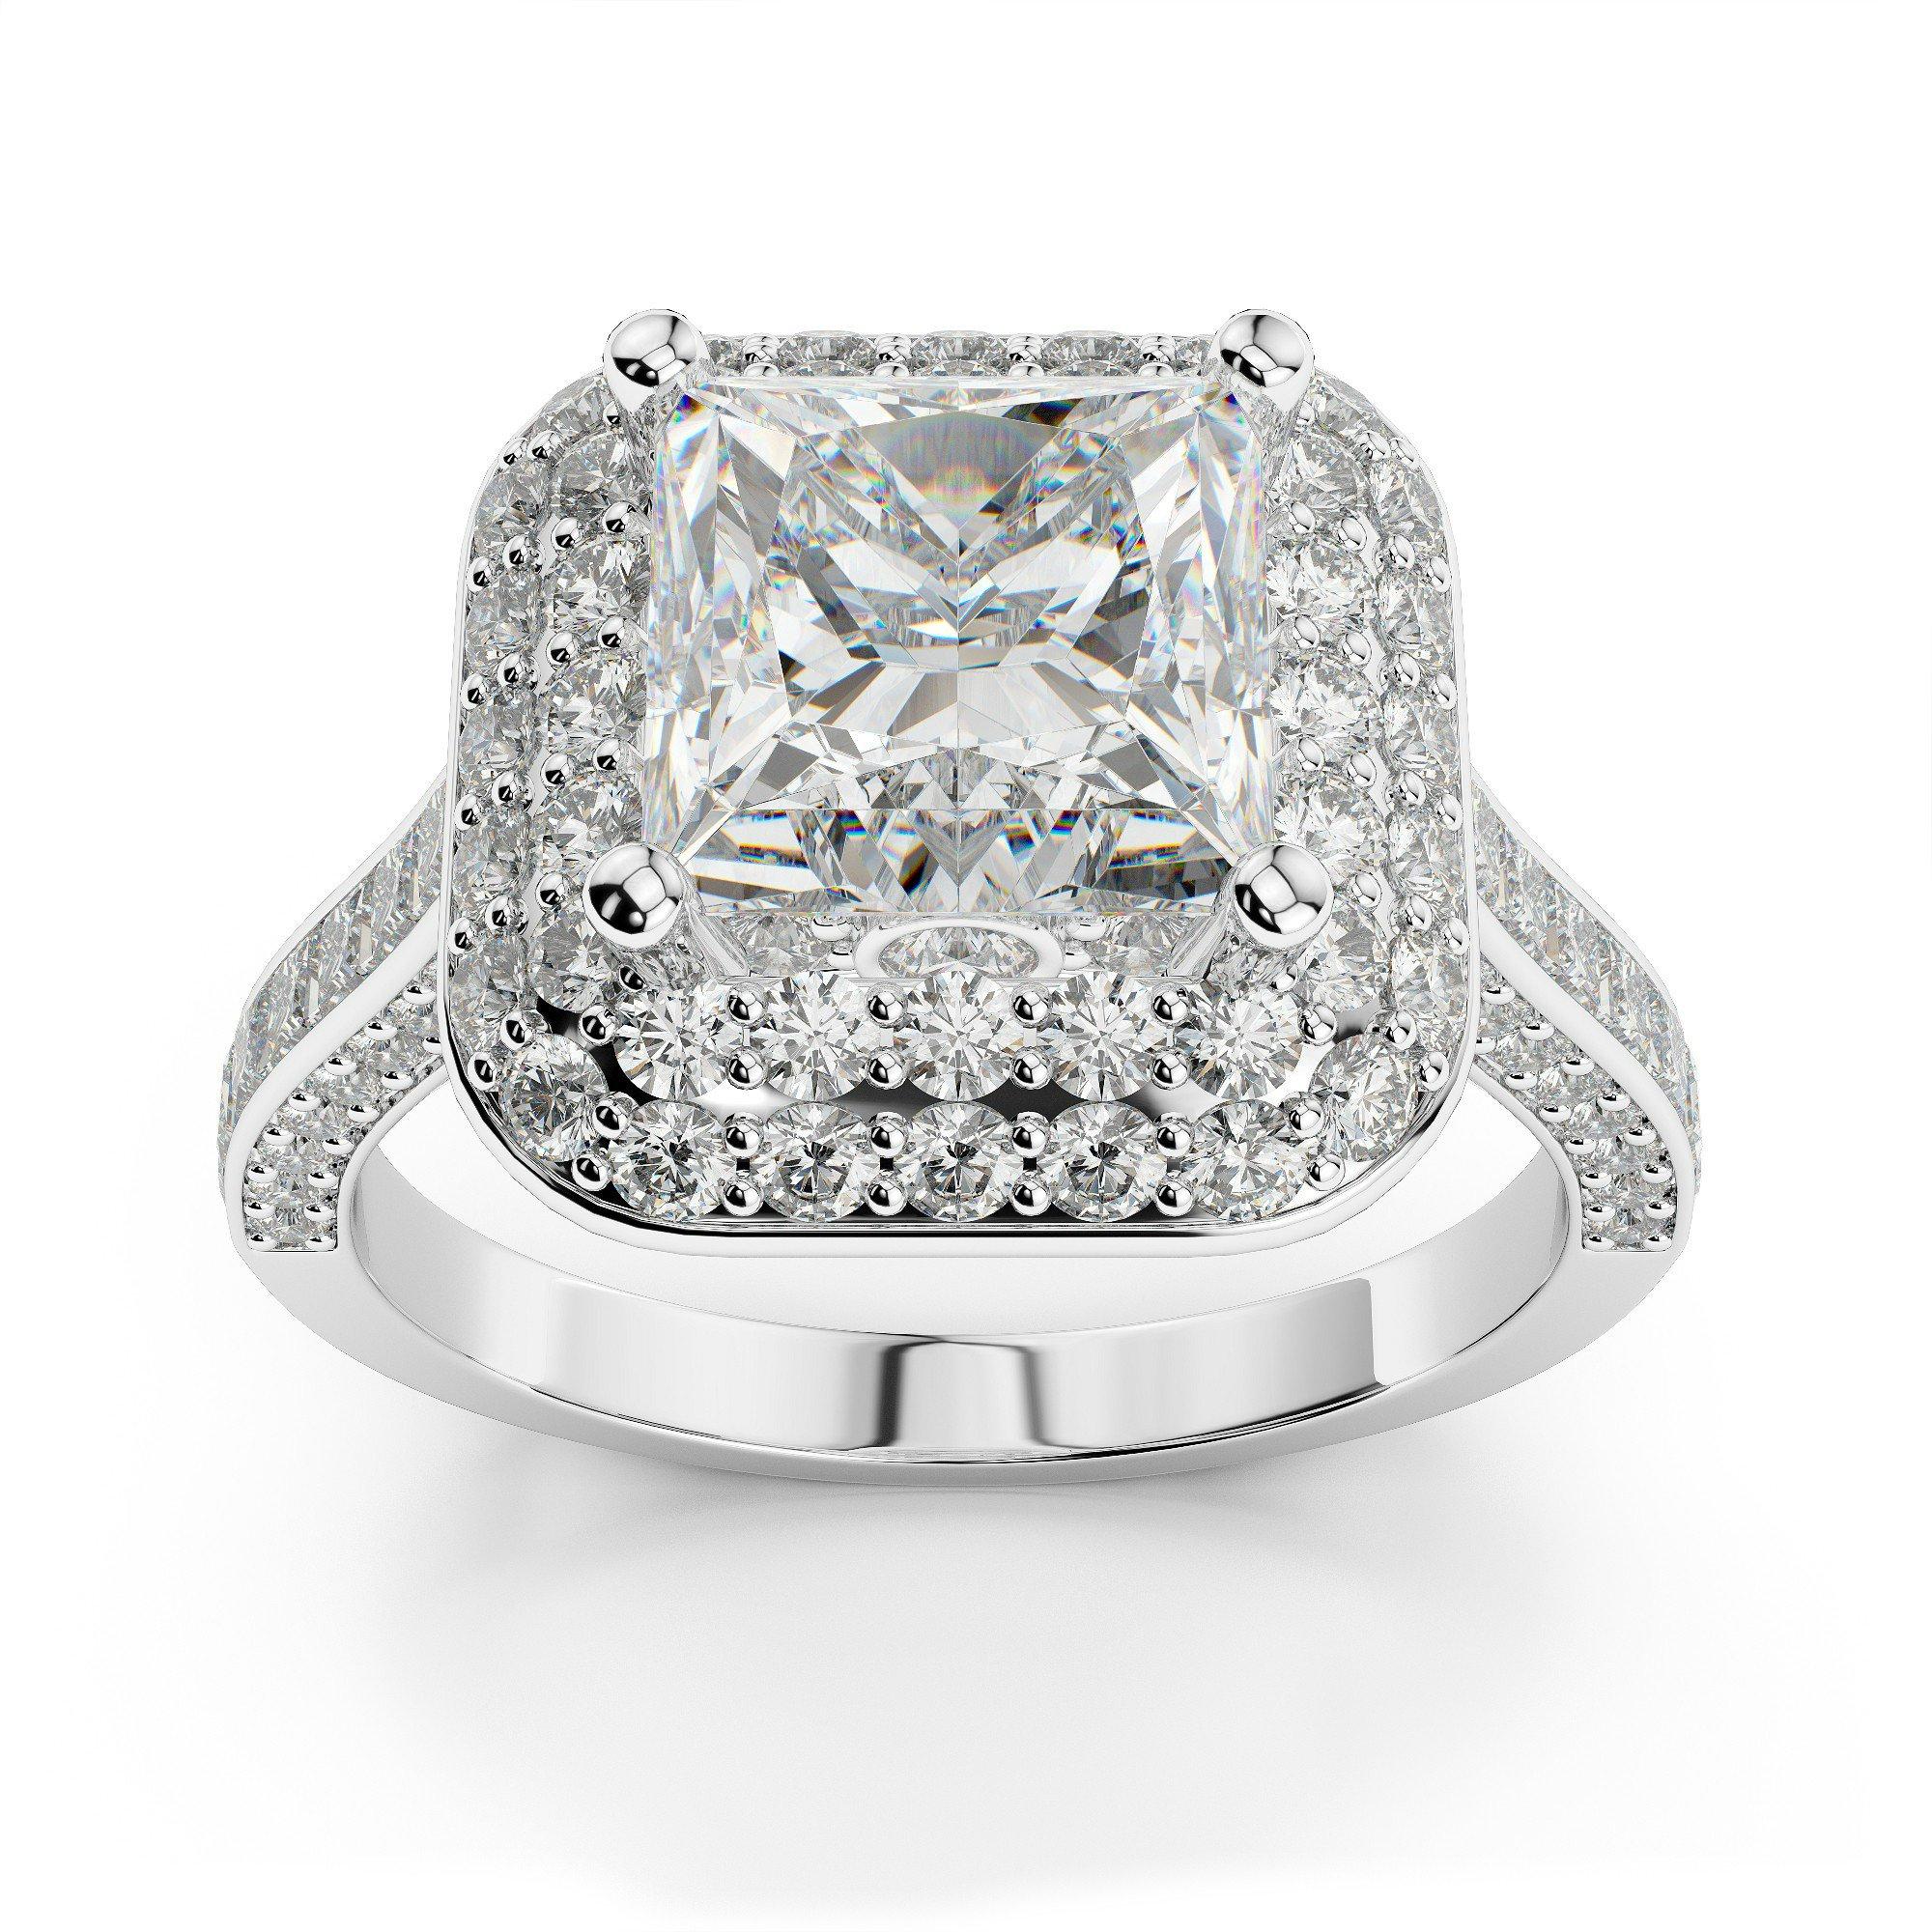 2.14 ctw Princess Diamond Double Halo Engagement Ring